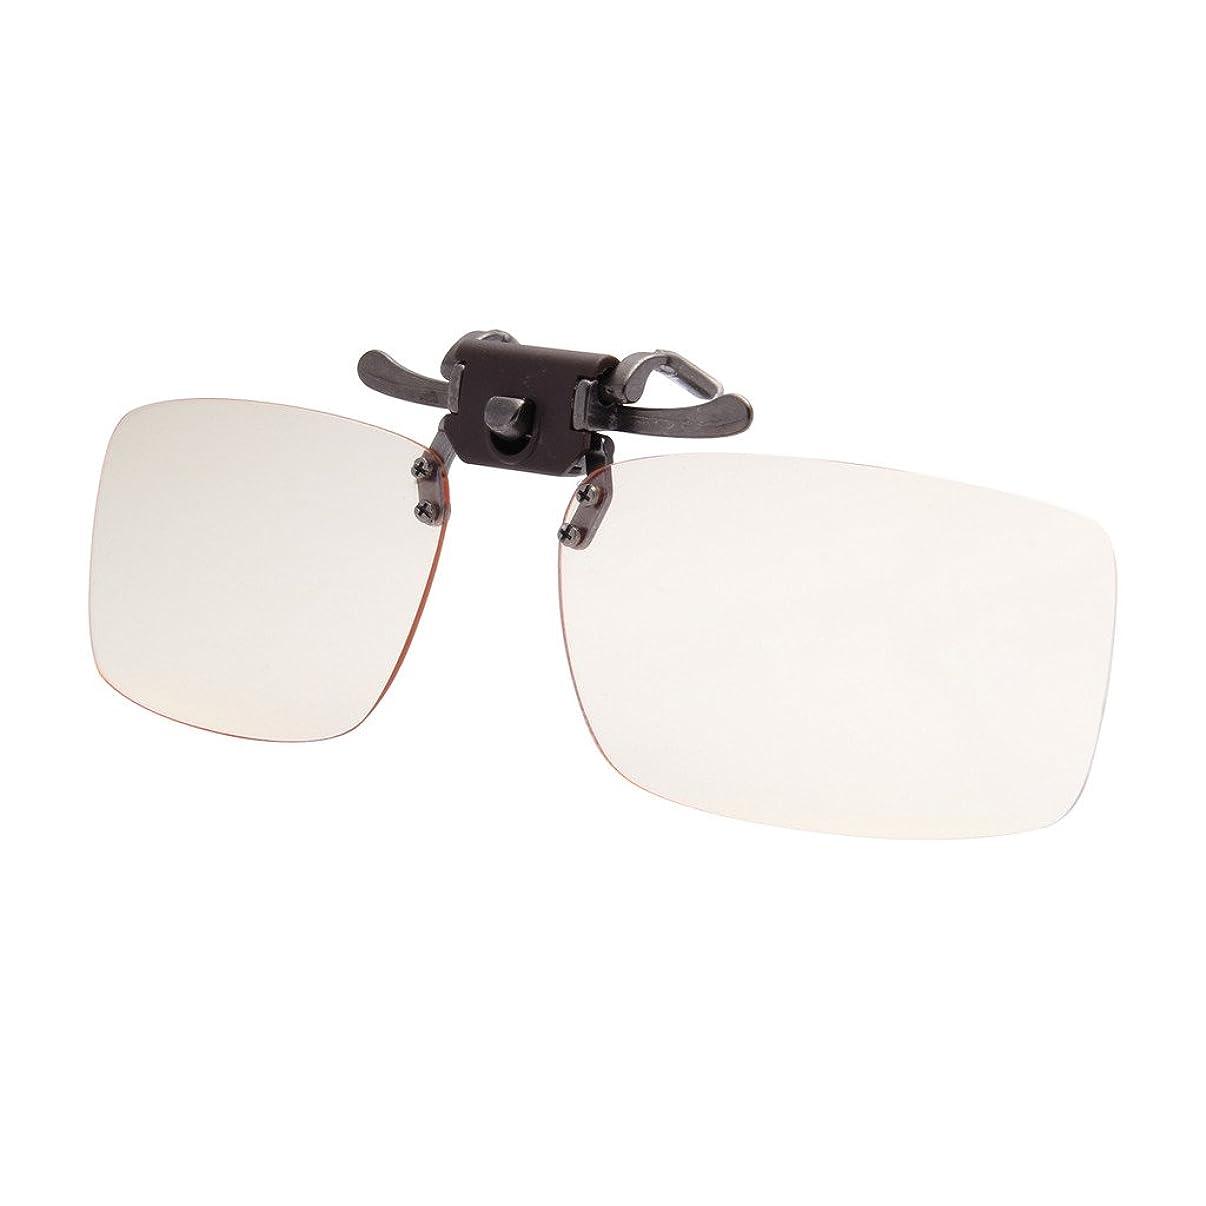 LianSan Tinted Blue Light Blocking Computer Glasses Clip On for Myopic Lens Gaming Eyeglasses Anti Glare Eye Strain Non Prescription Readers LSP6260 yellow